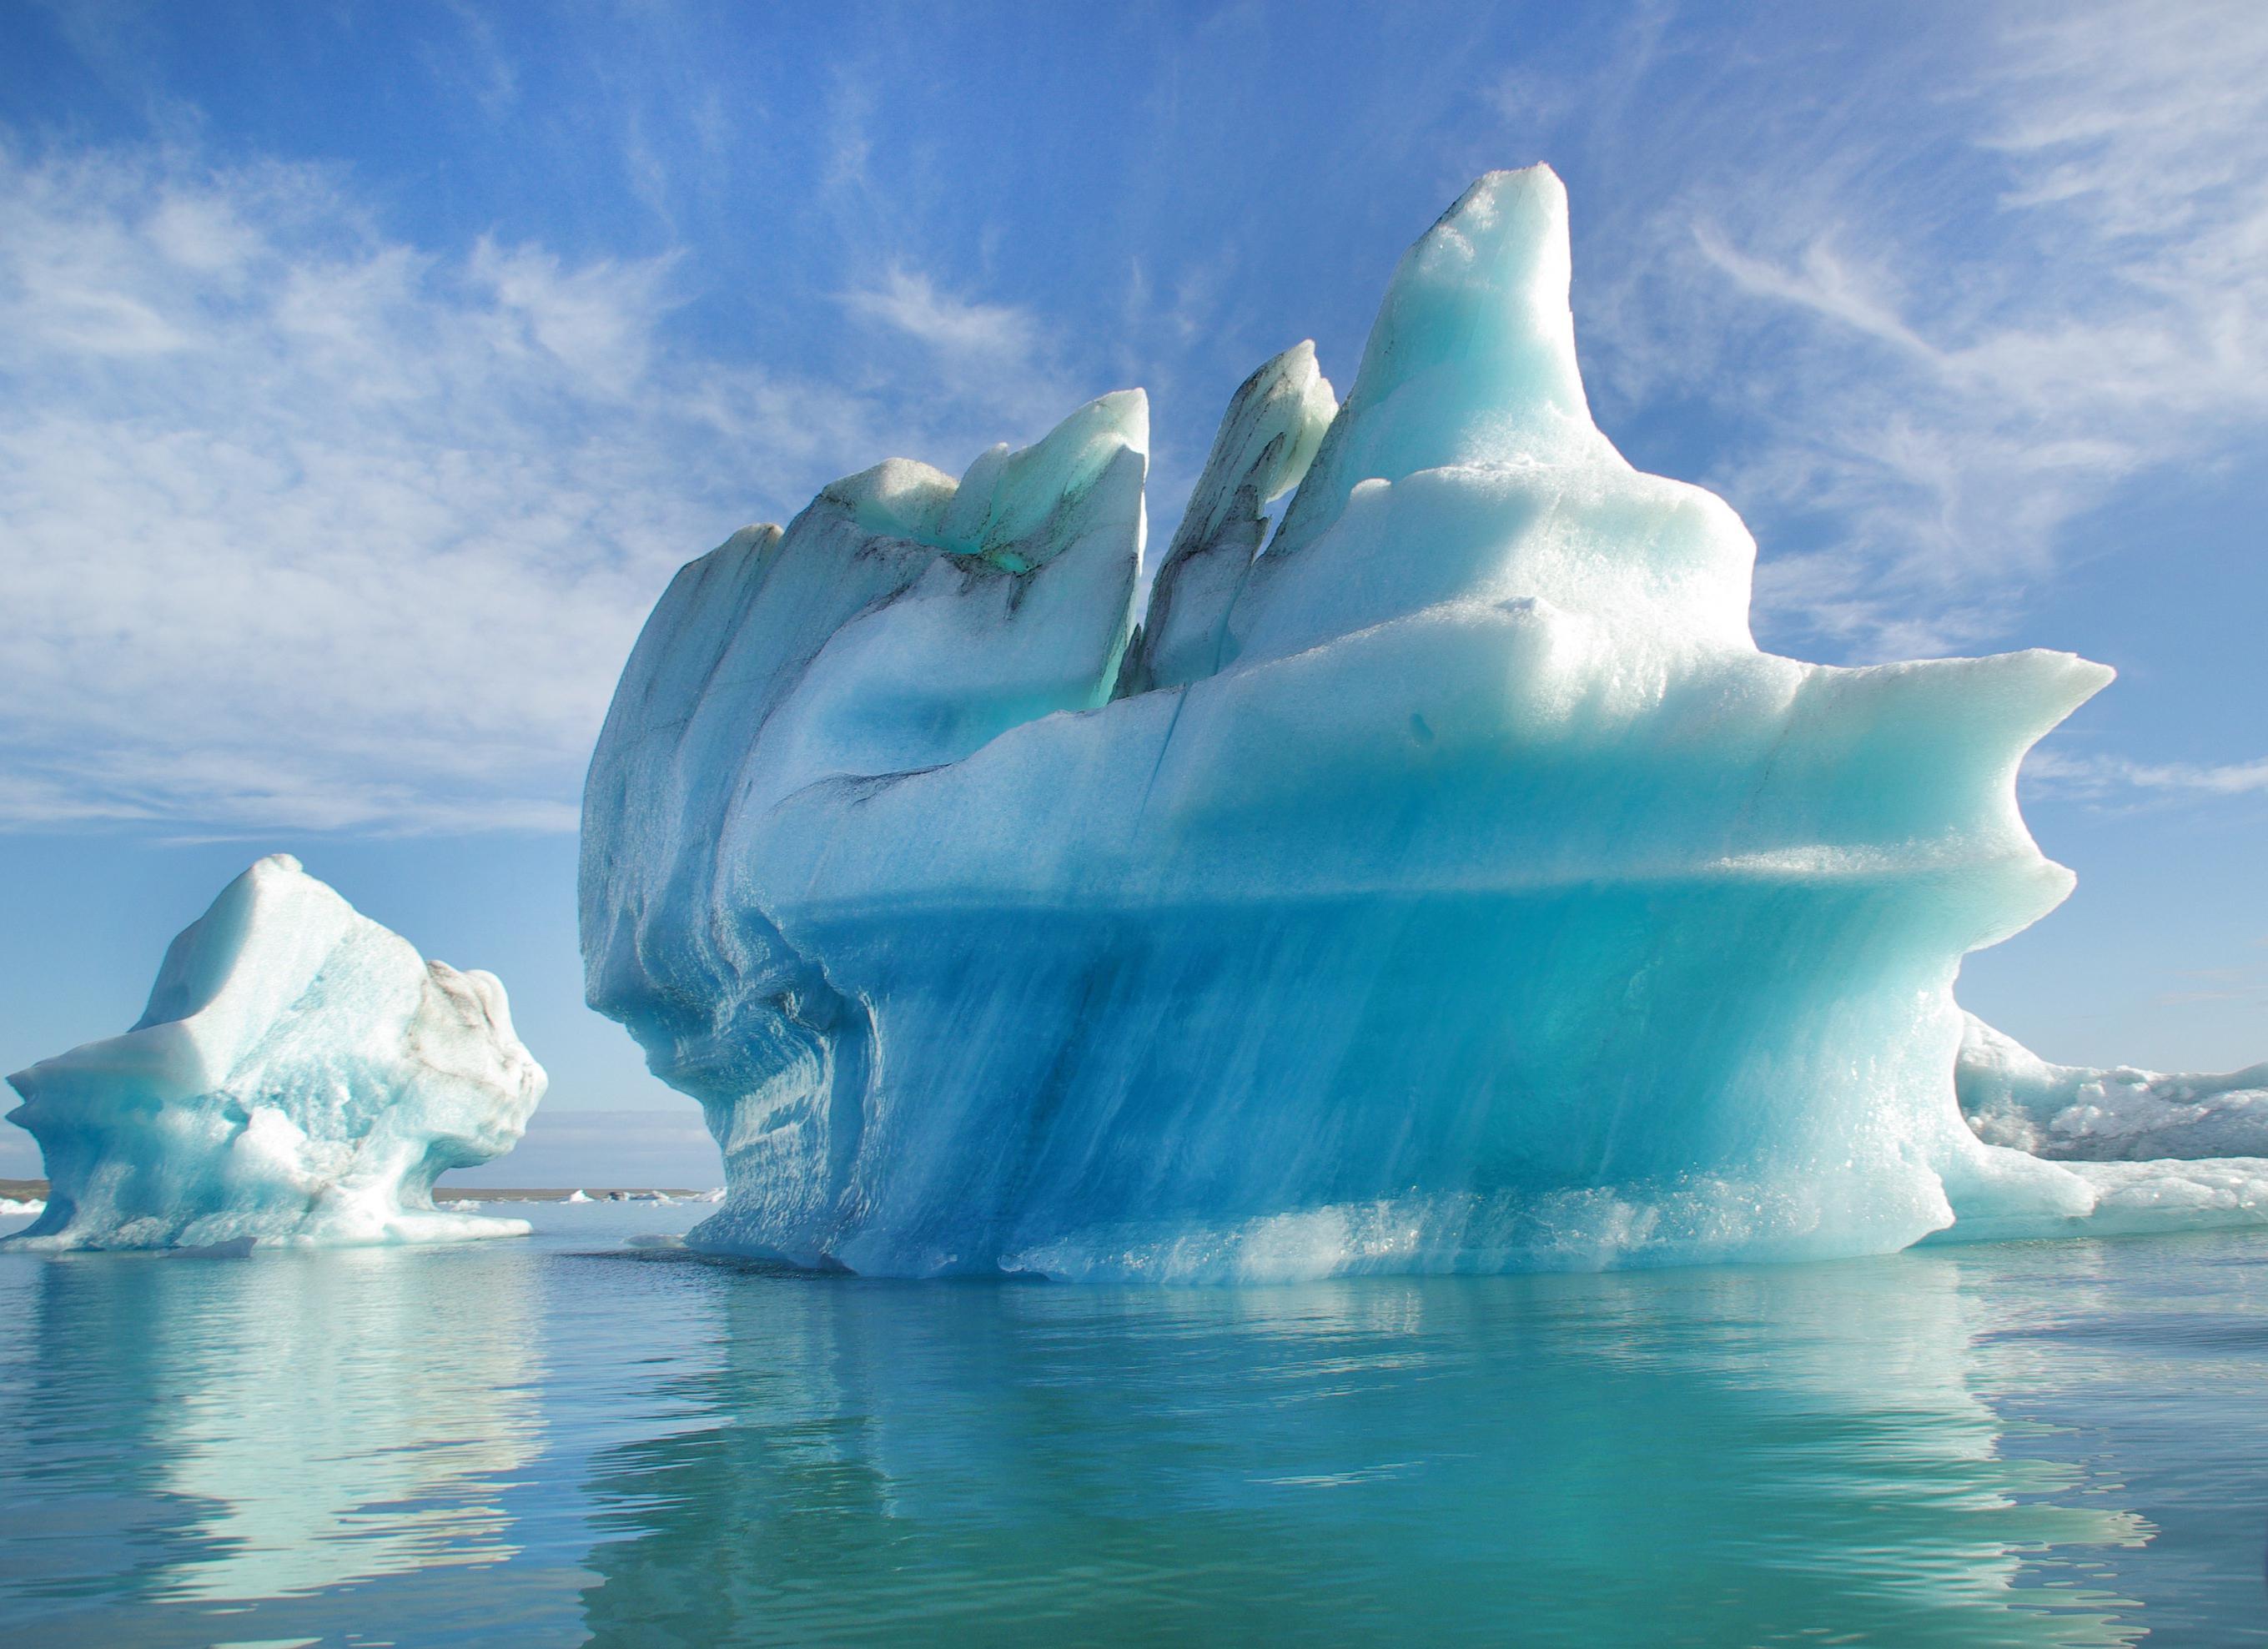 Europa, Island, Suedisland, Gletscherlagune Joekulsarlon, Eisberg, Eis, Landschaft, Natur, 8/2014